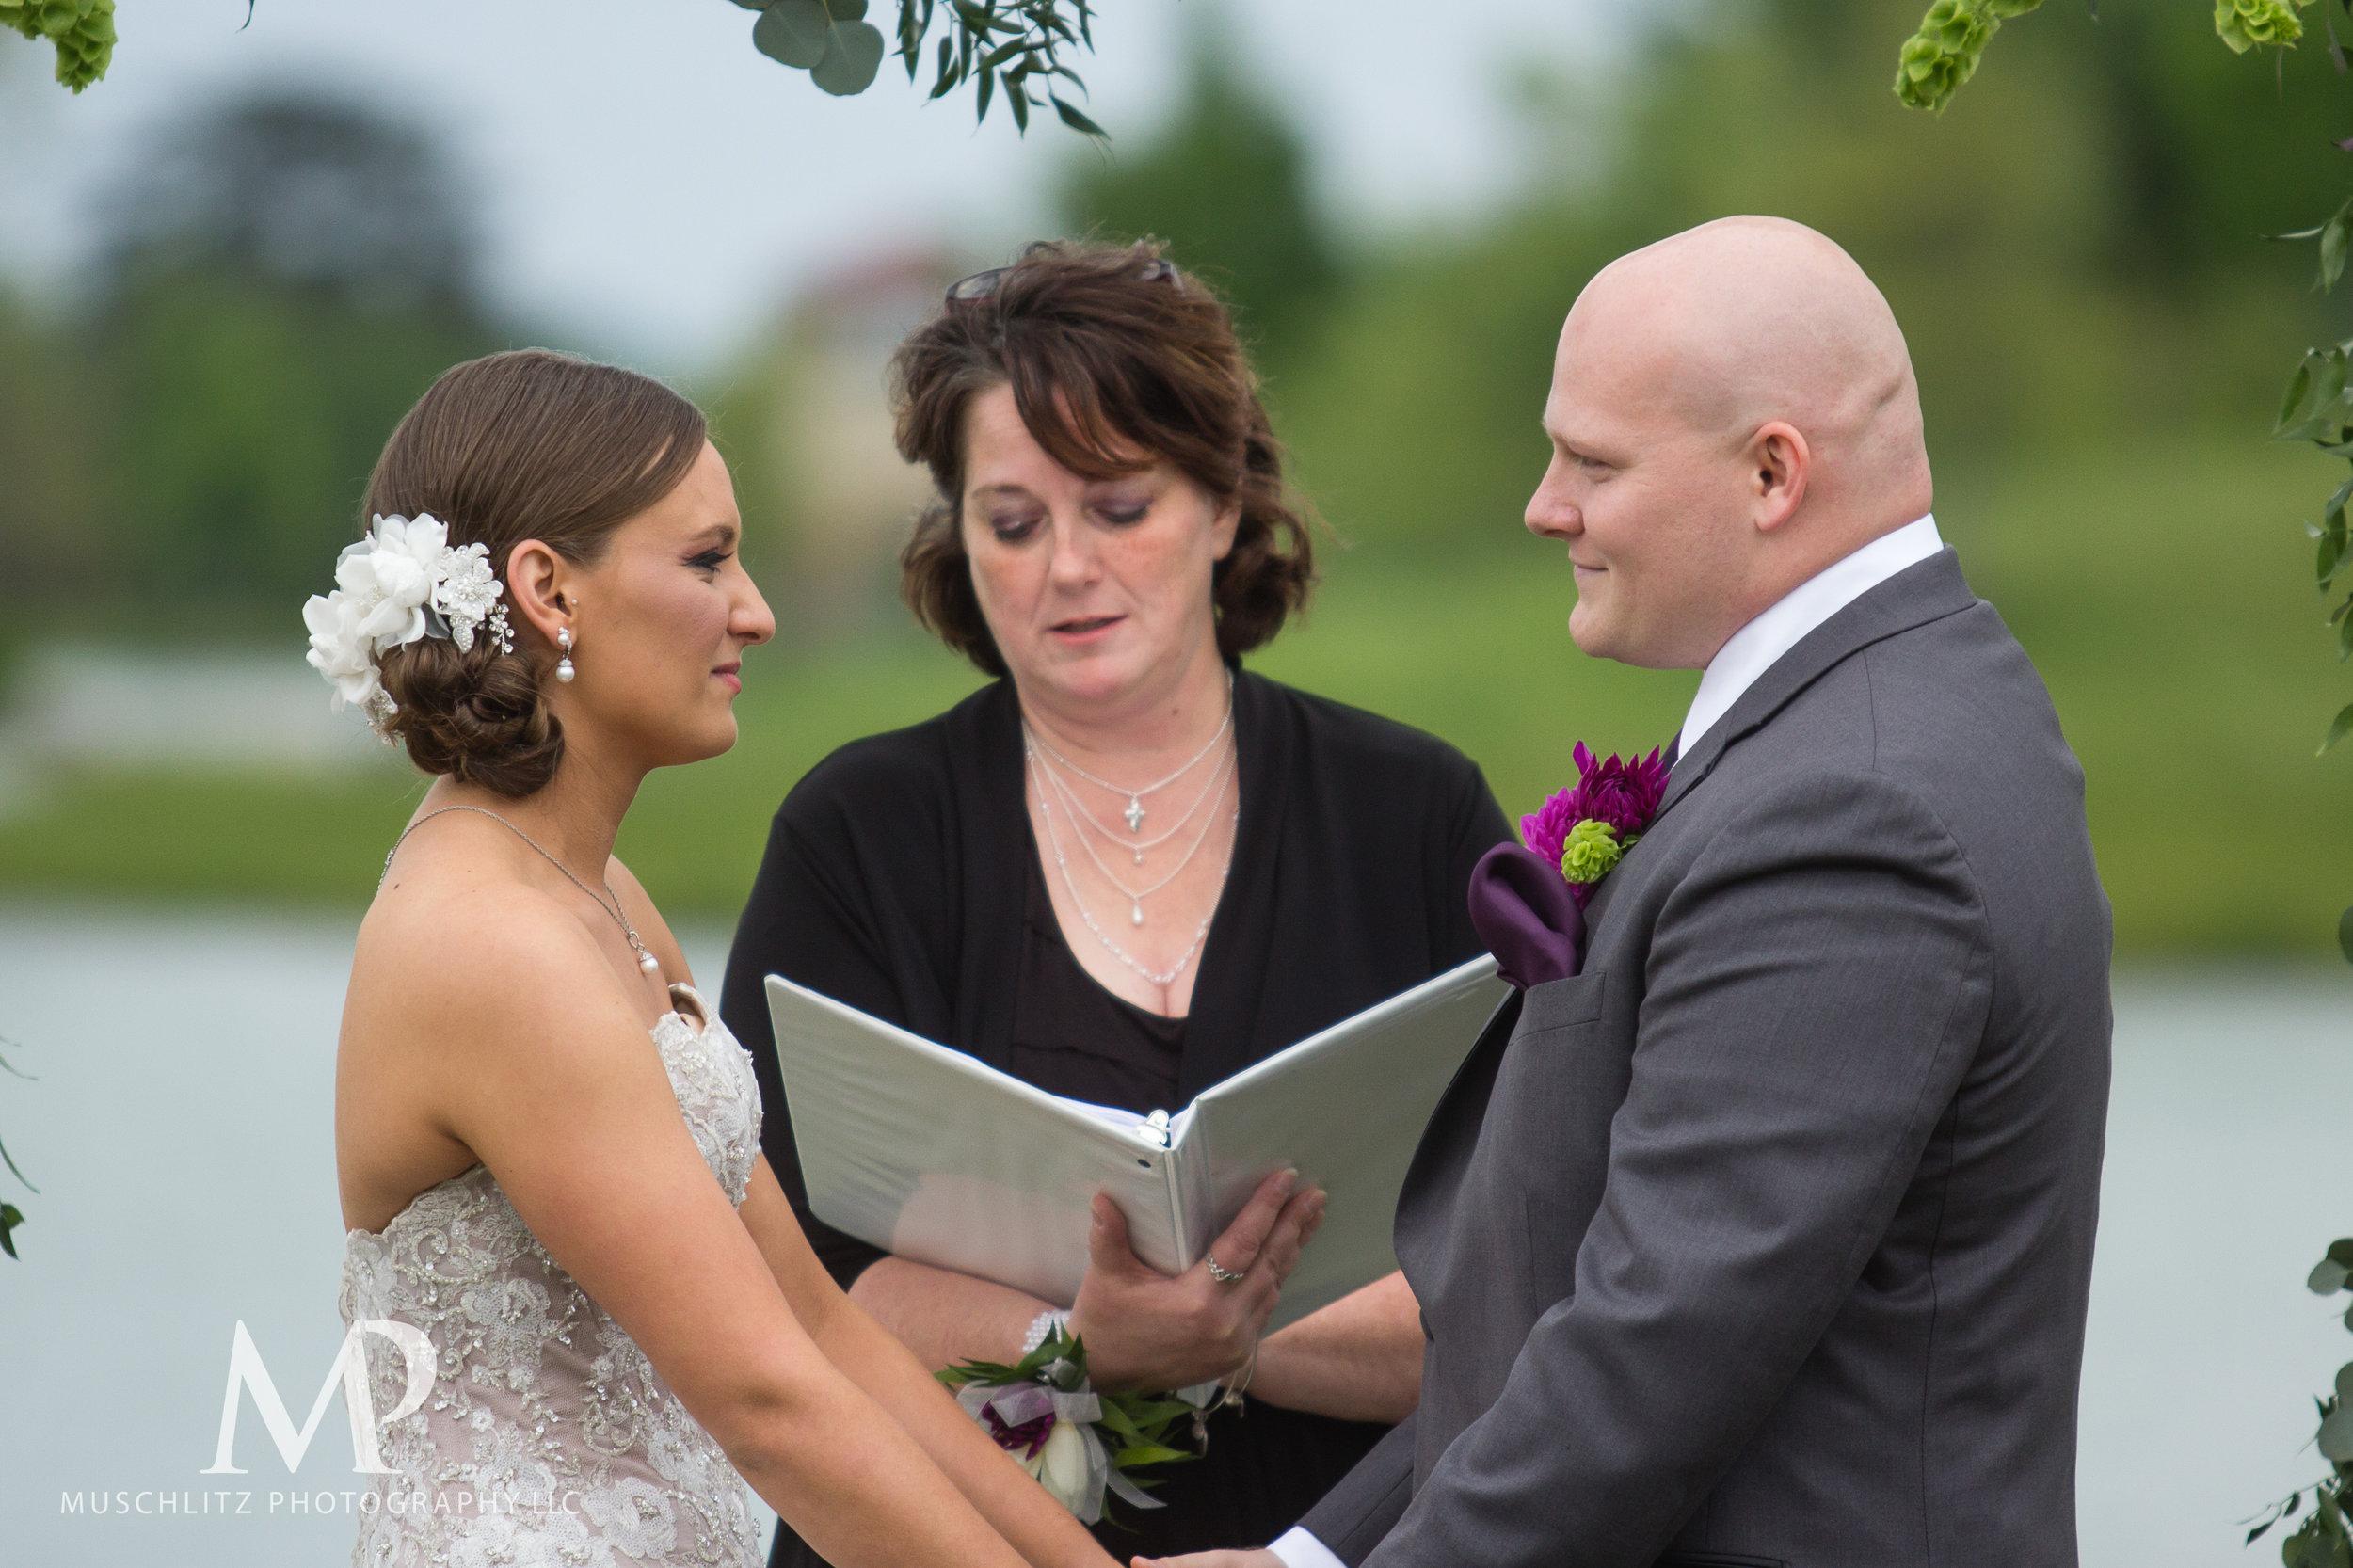 club-at-corazon-wedding-ceremony-reception-columbus-dublin-ohio-ohio-university-theme-041.JPG